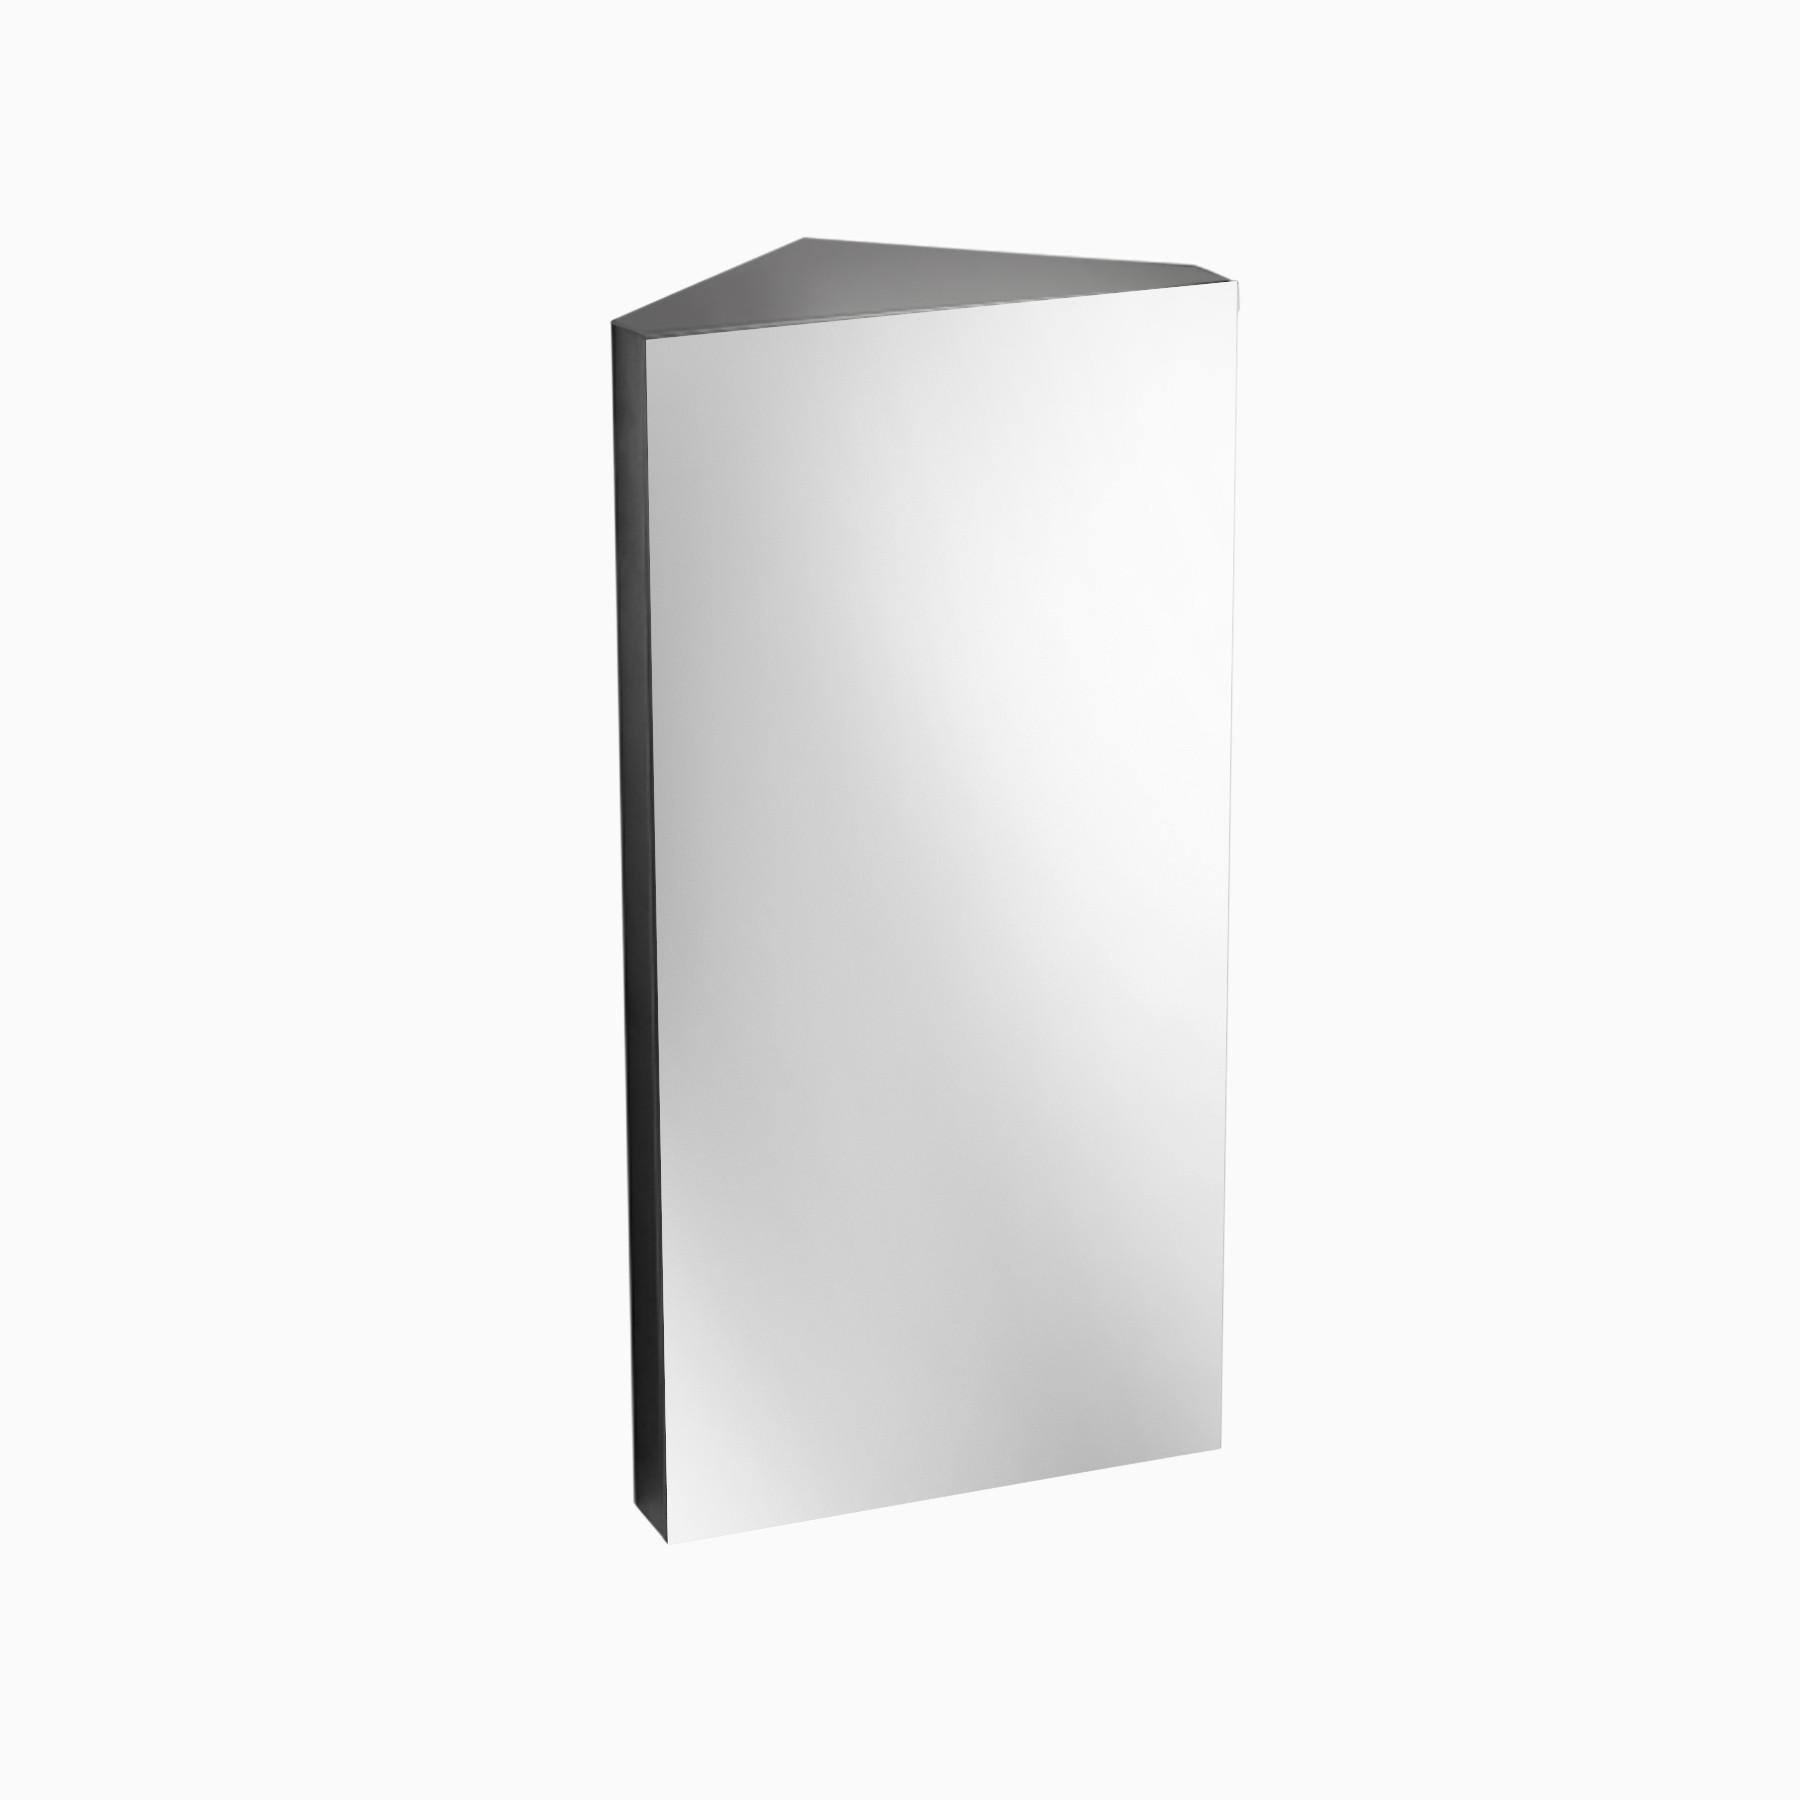 24 Inch Del Rey Rectangular Corner Medicine Cabinet   Corner Medicine  Cabinet